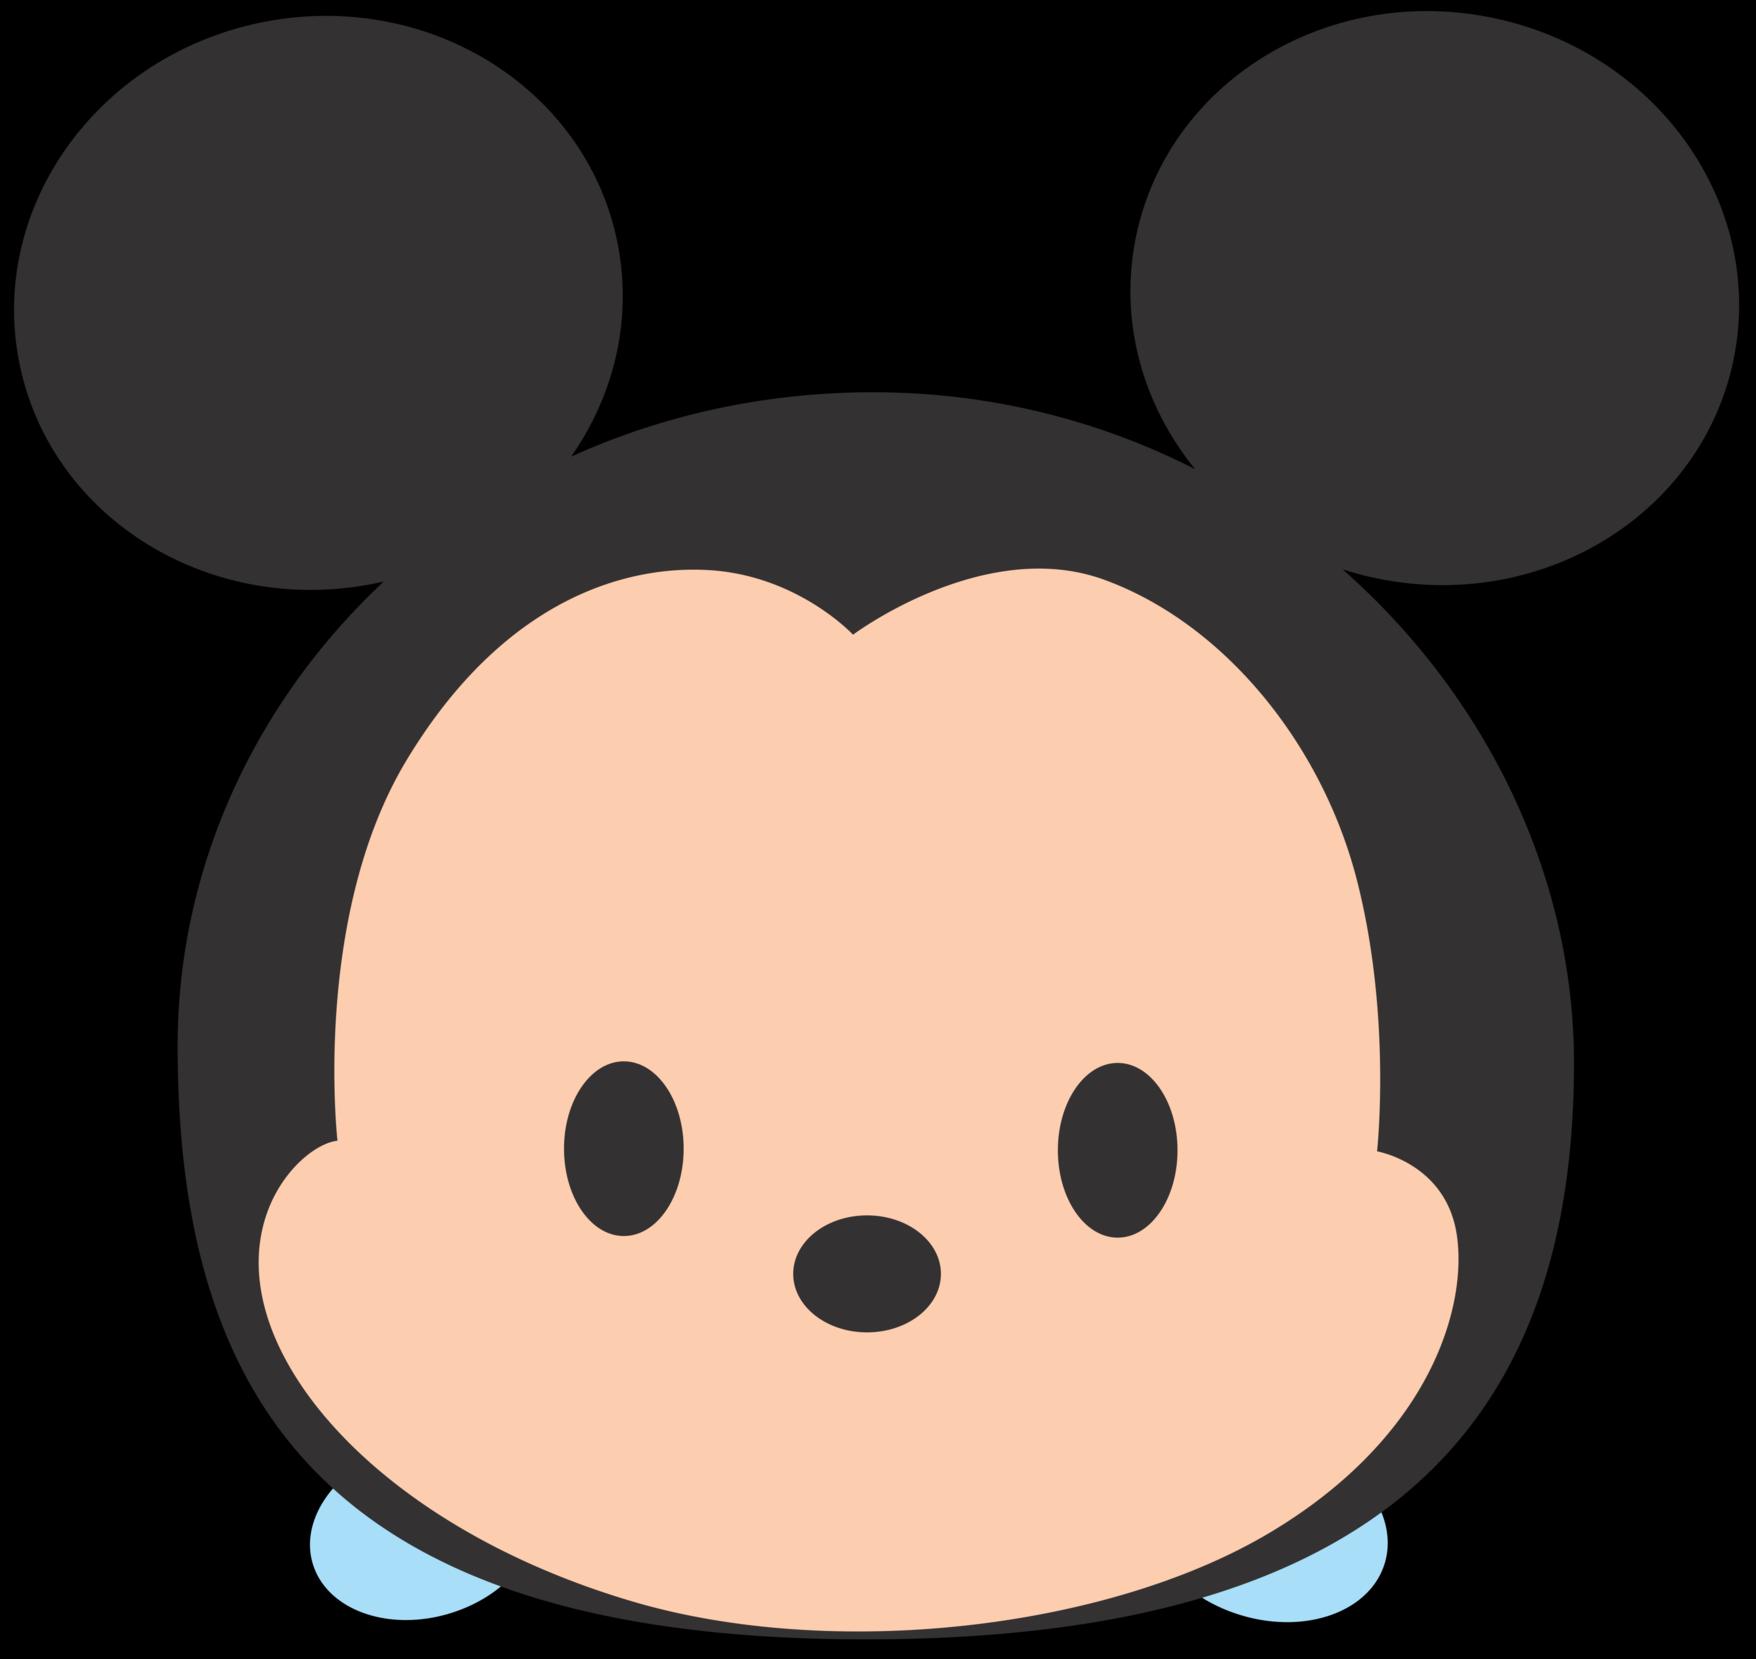 Disney tsum . Pumpkin clipart mickey